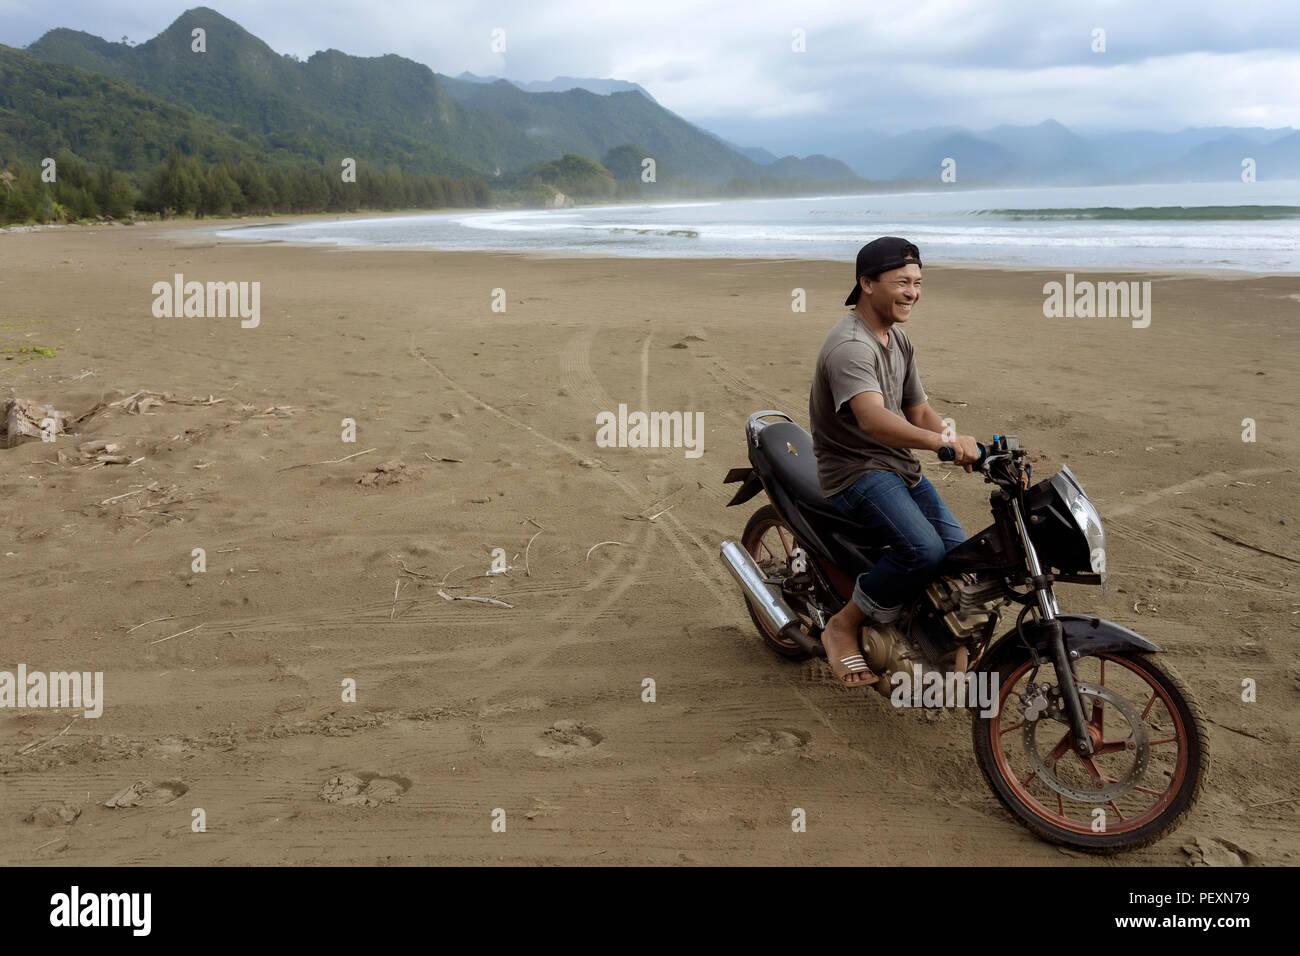 Asian man on motorcycle on beach, Banda Aceh, Sumatra, Indonesia - Stock Image